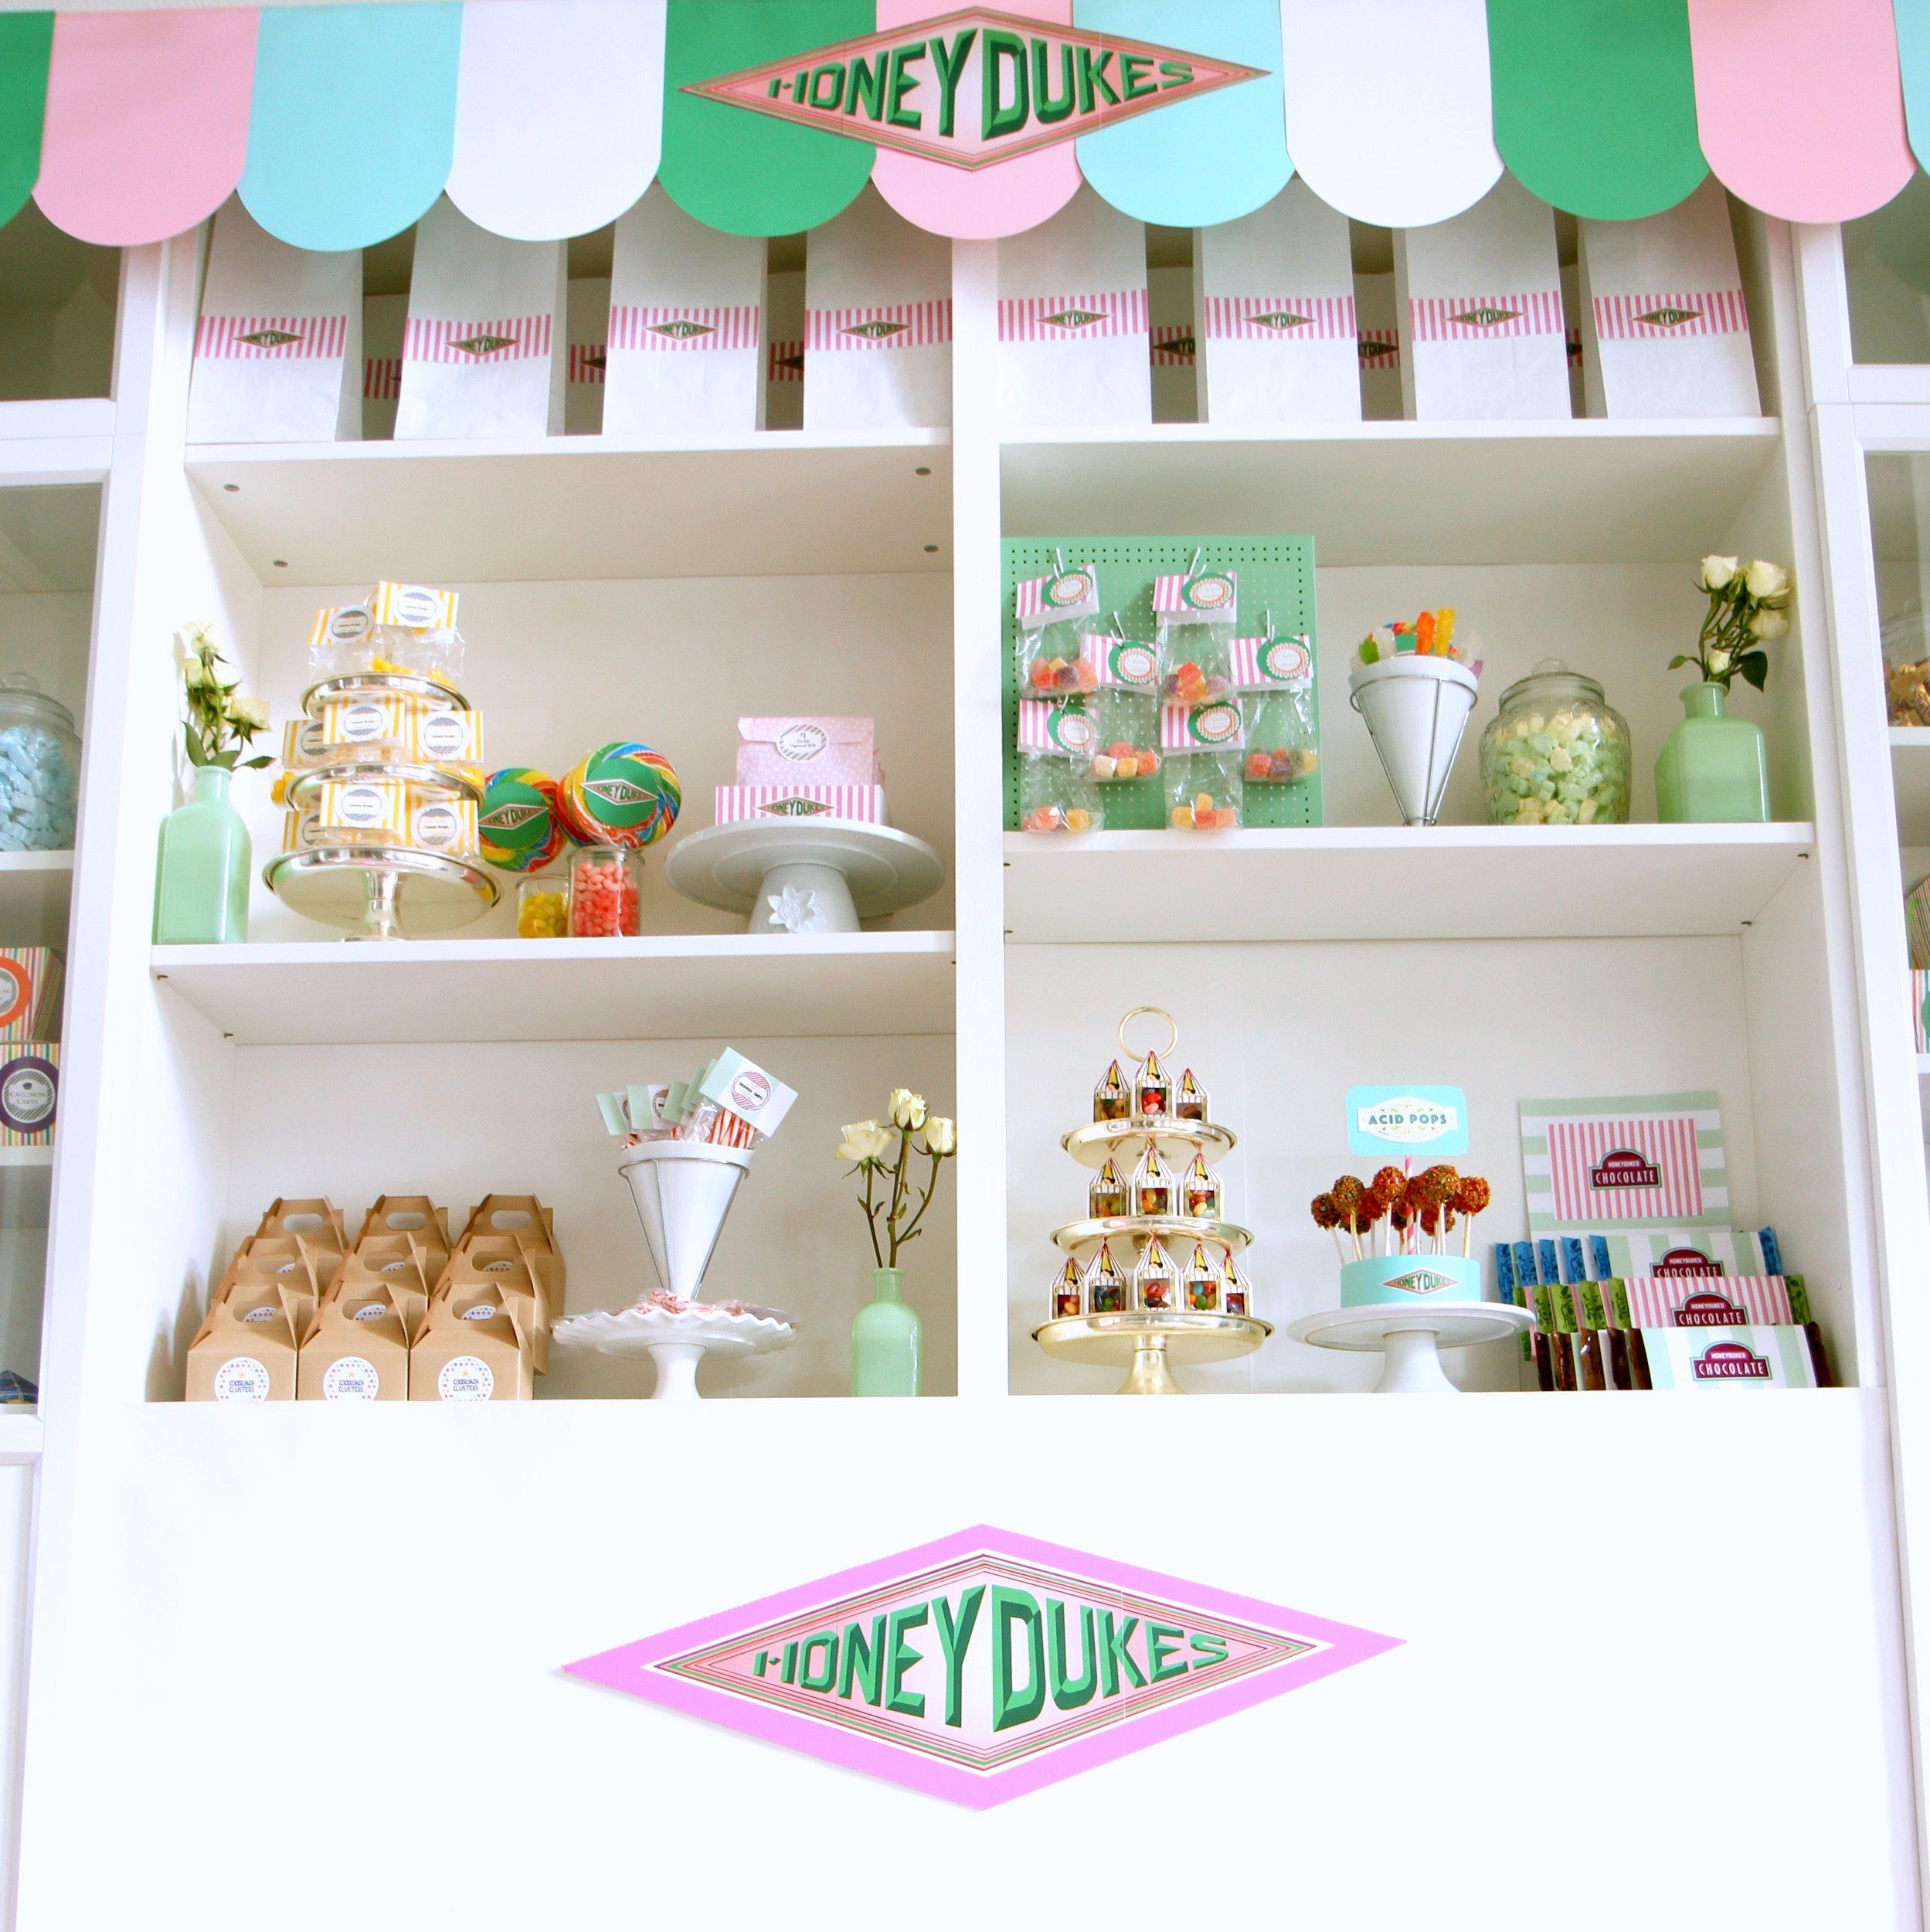 harry potter birthday party- honeydukes sweet shoppe